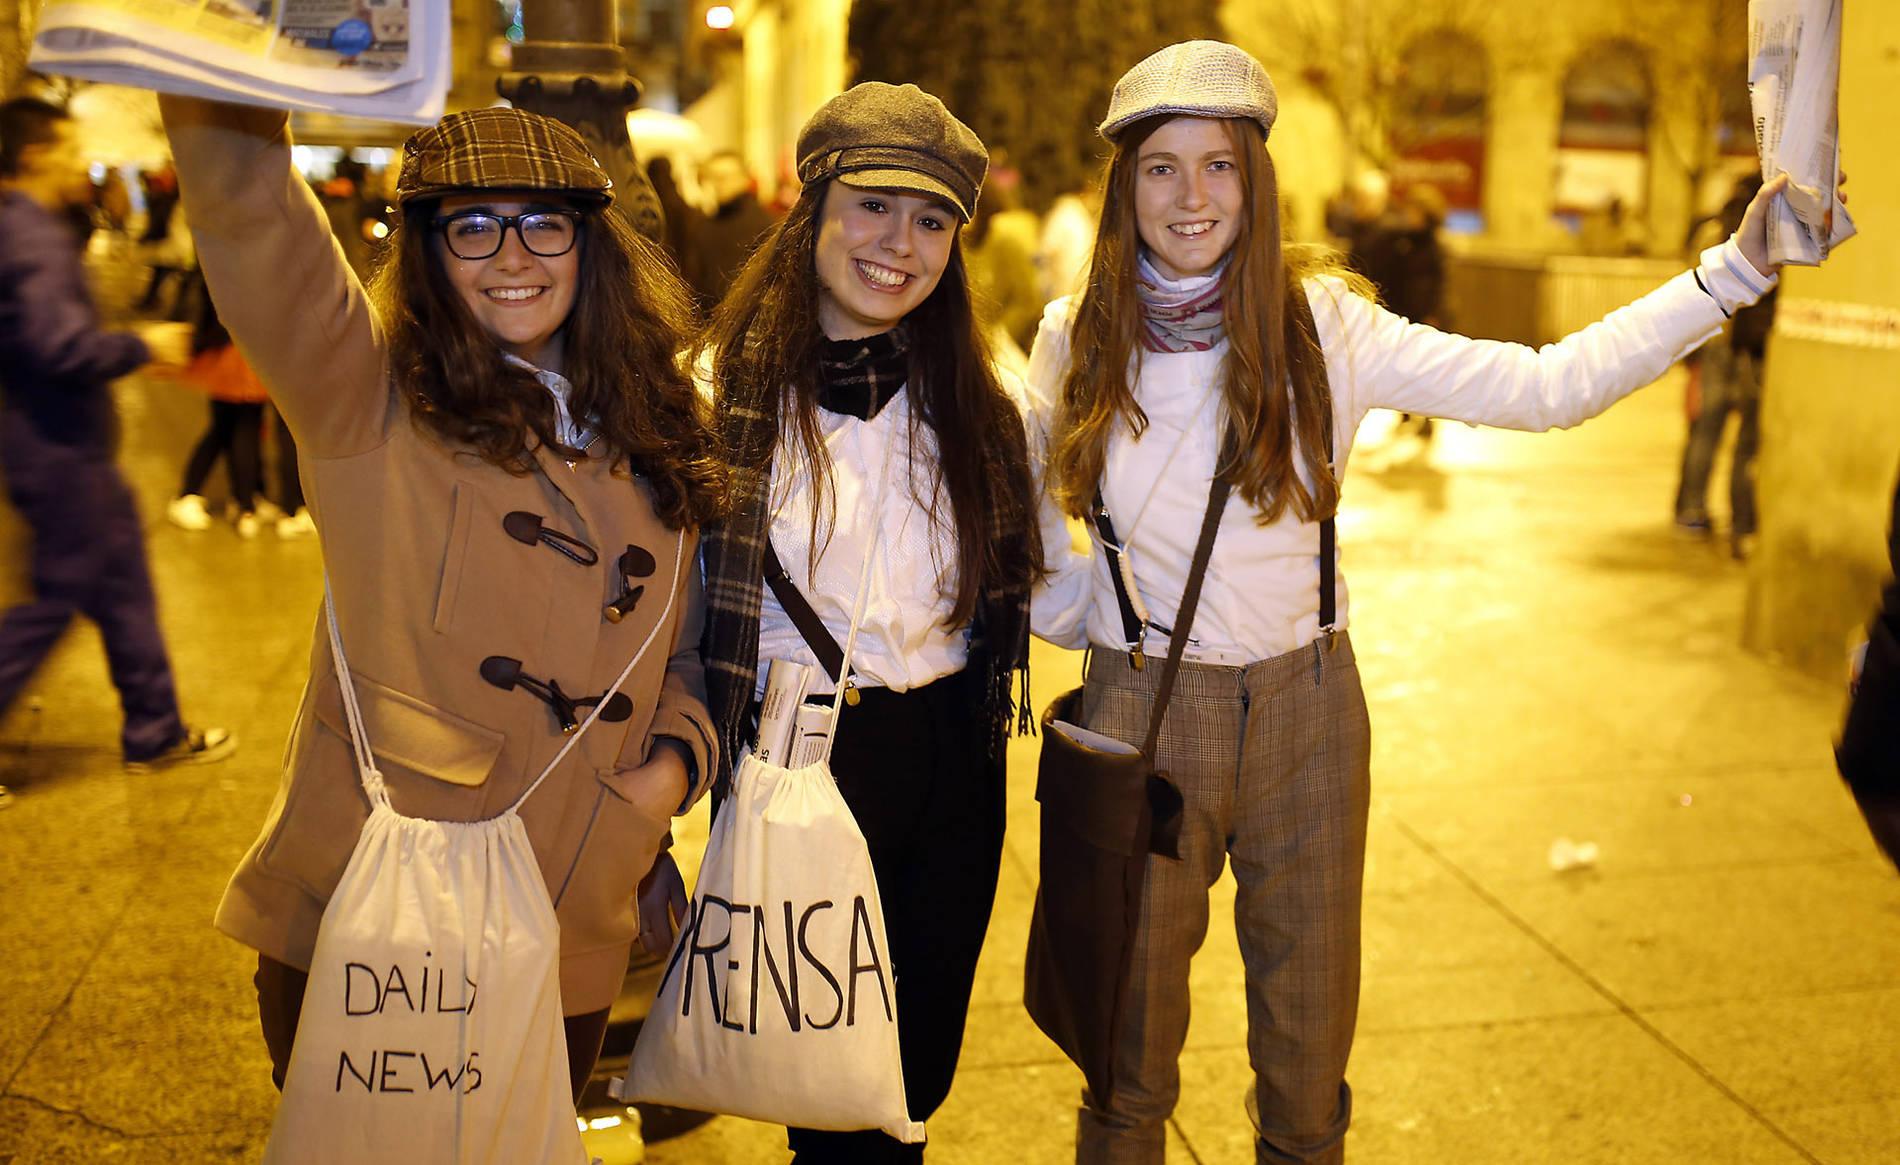 Fotos de Nochevieja 2017 en Pamplona (II) (1/89) - Imágenes de los disfraces de Nochevieja 2017 de Pamplona - Pamplona -